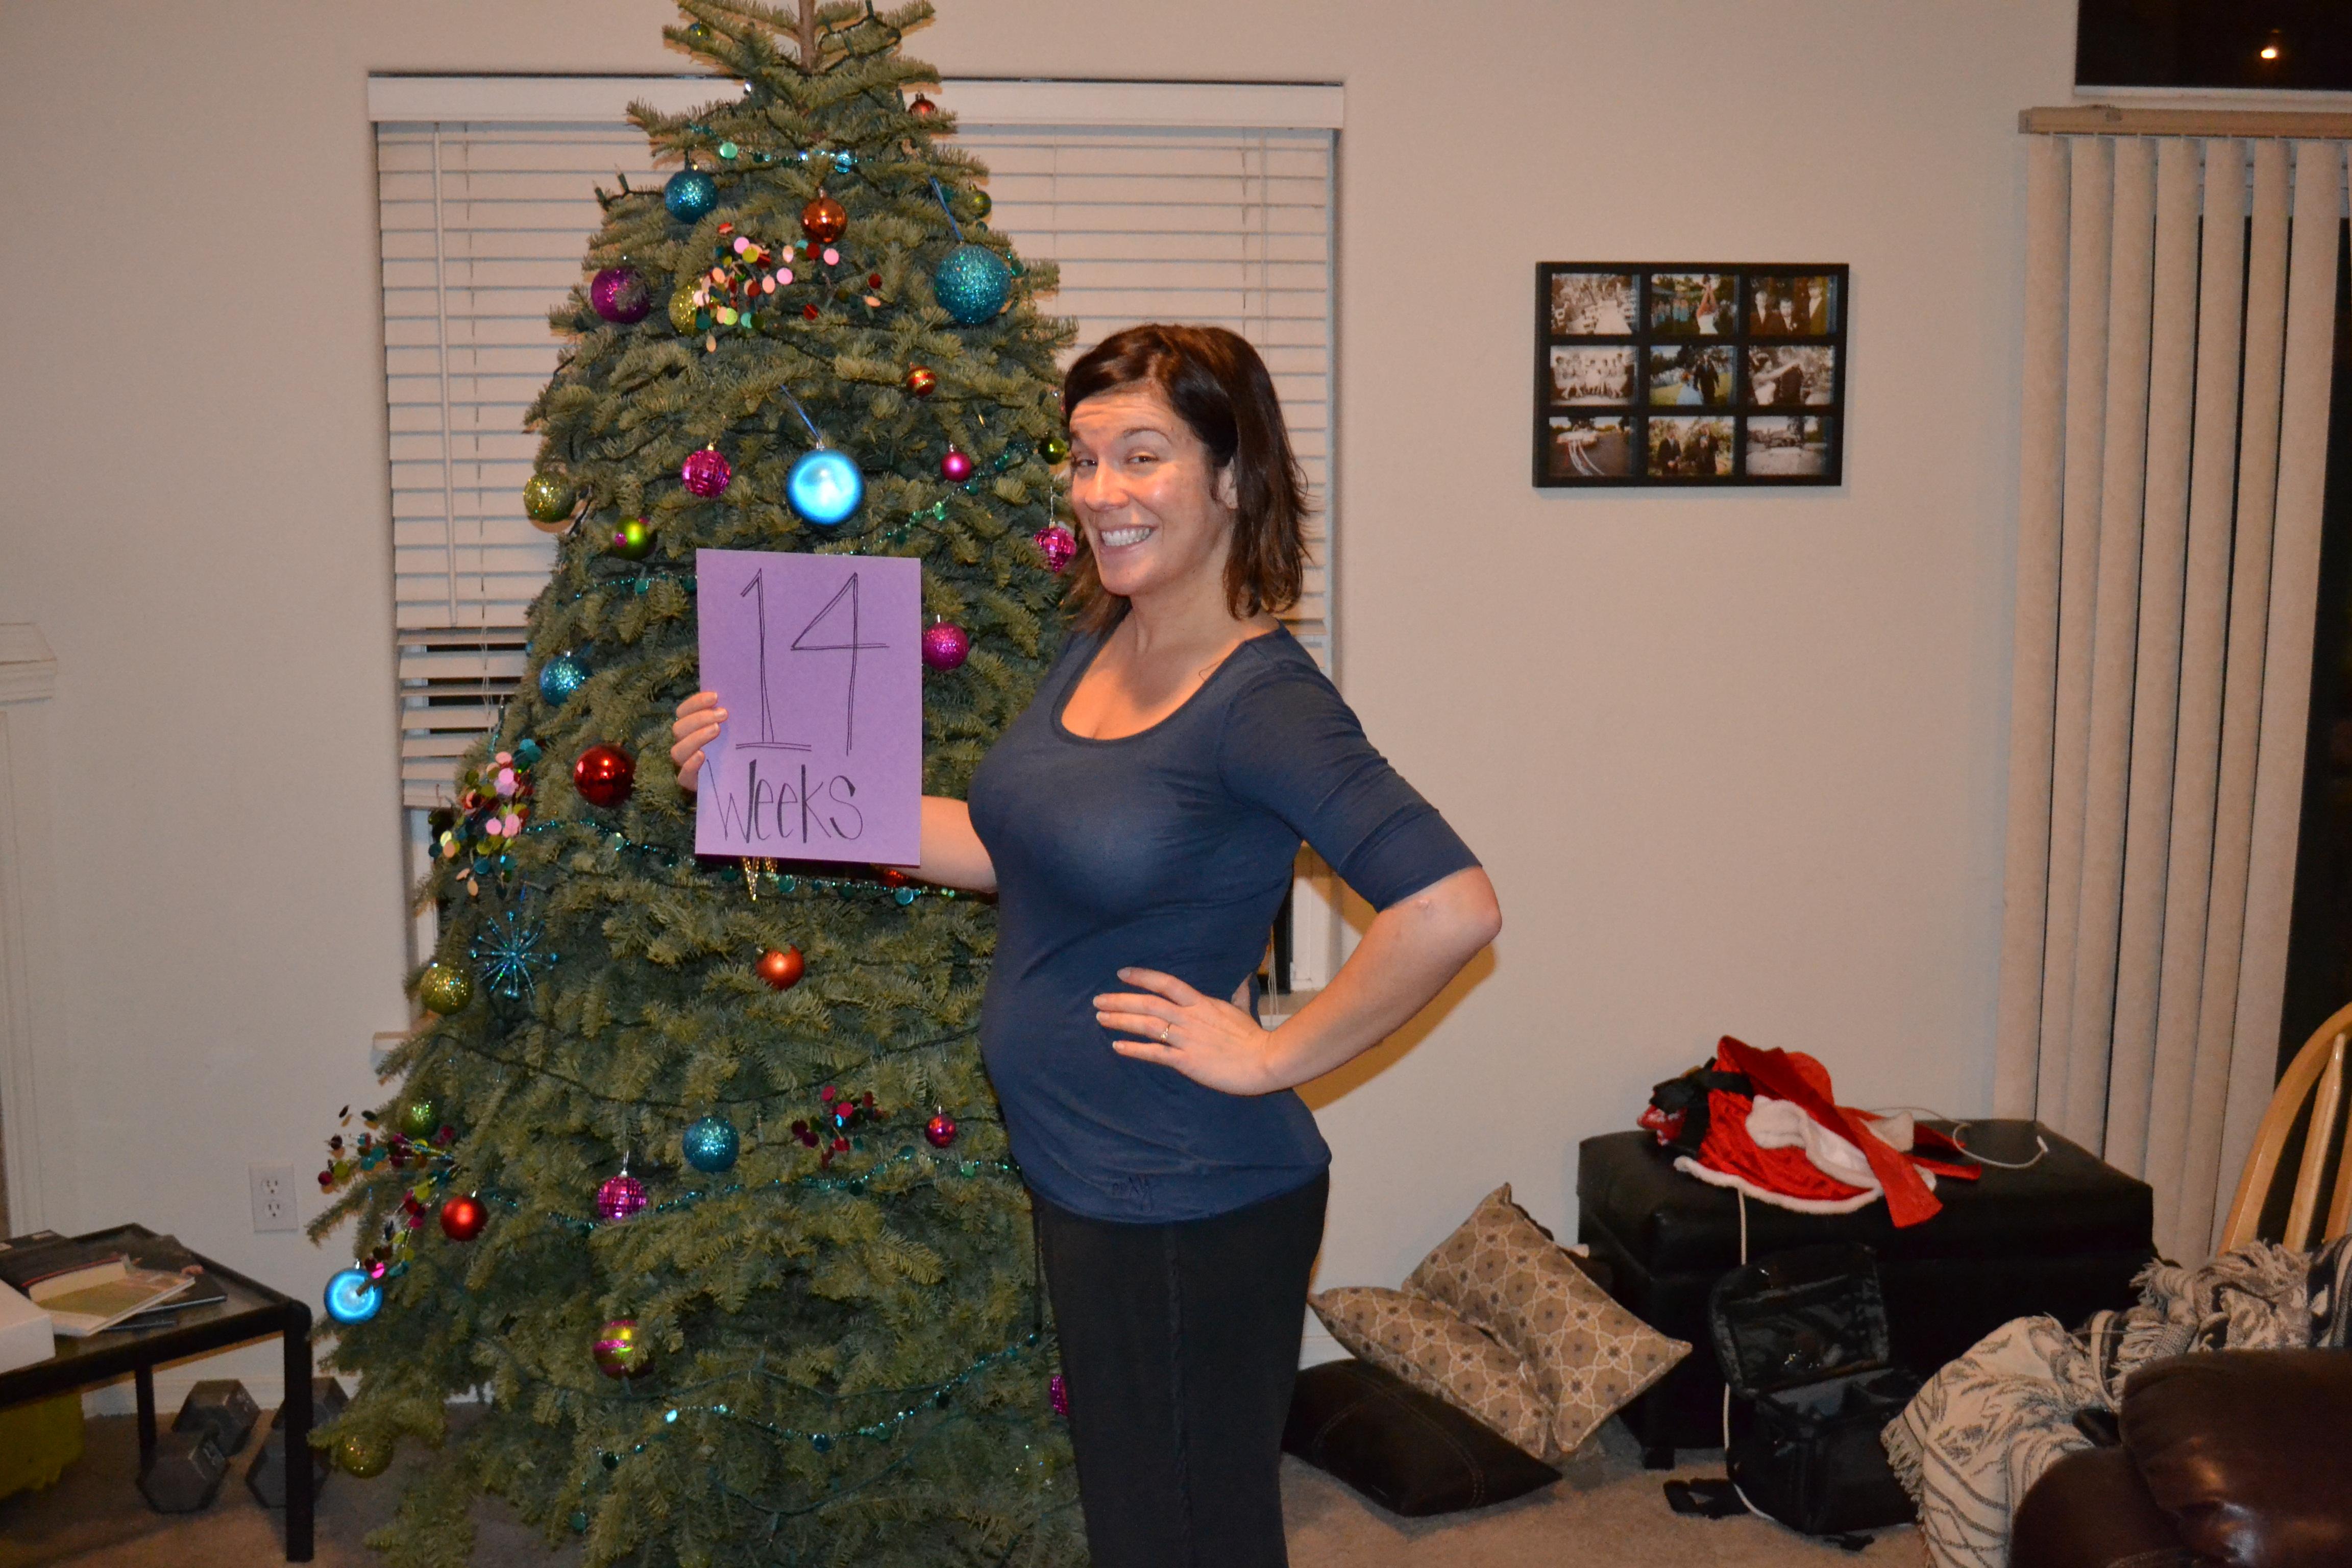 14 Weeks Pregnant Bump Baby – Home Exsplore